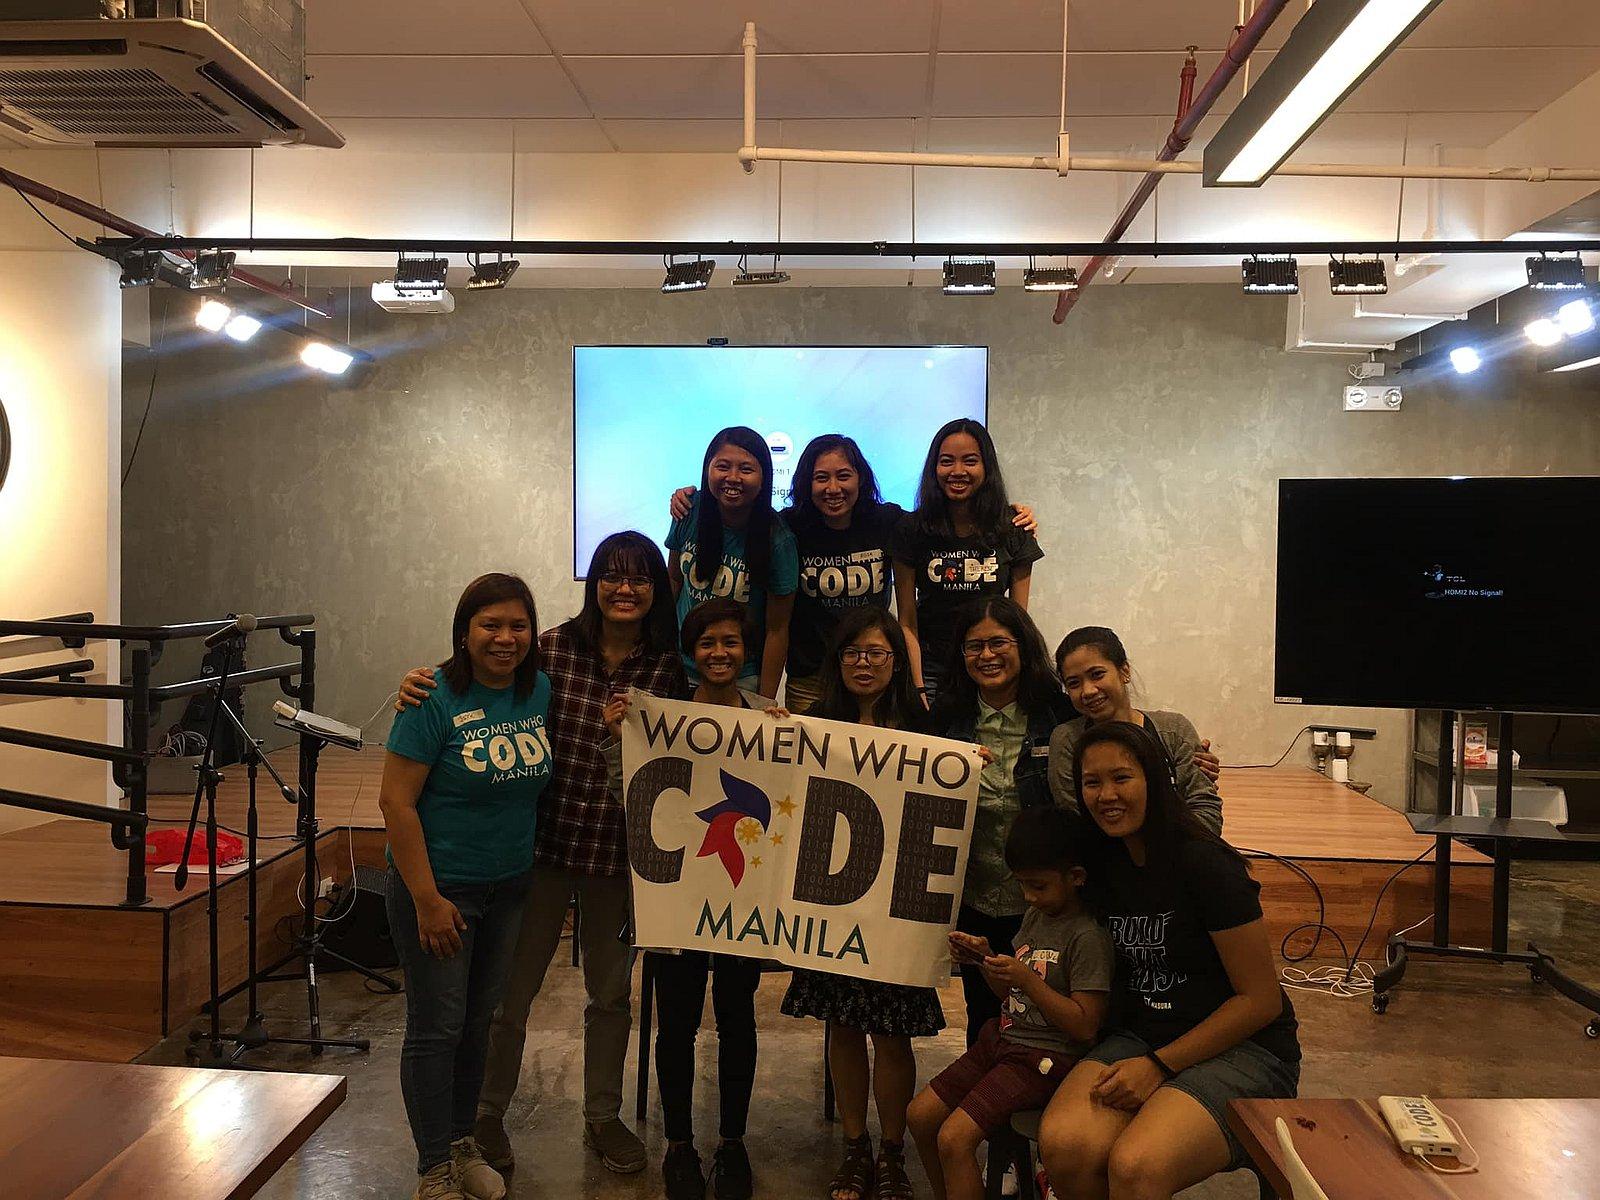 Koree with Women Who Code Manila